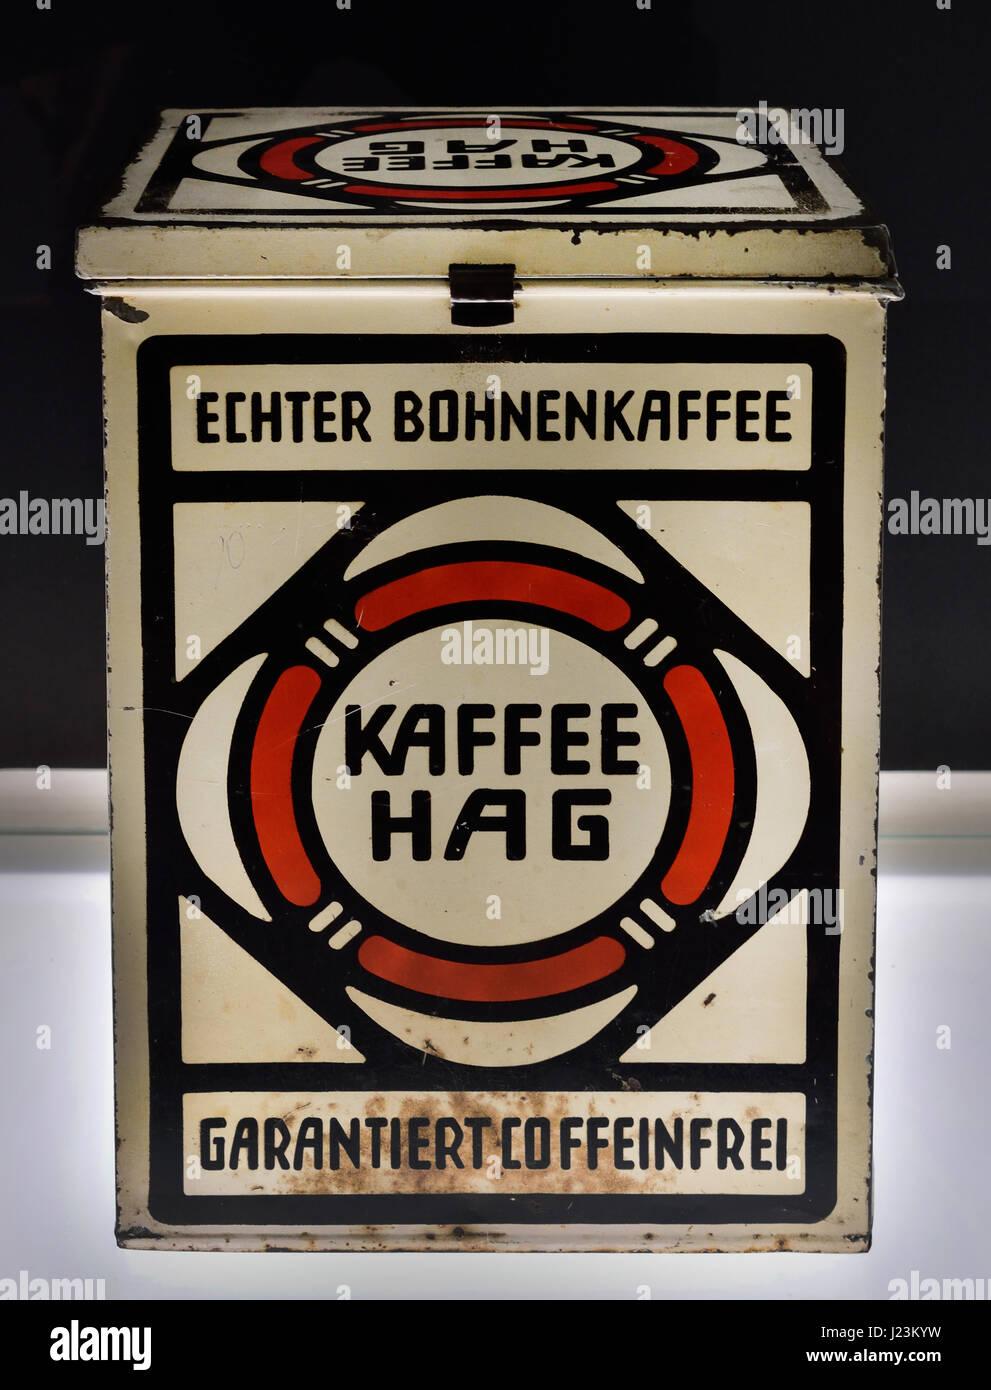 Kaffee hag bremen